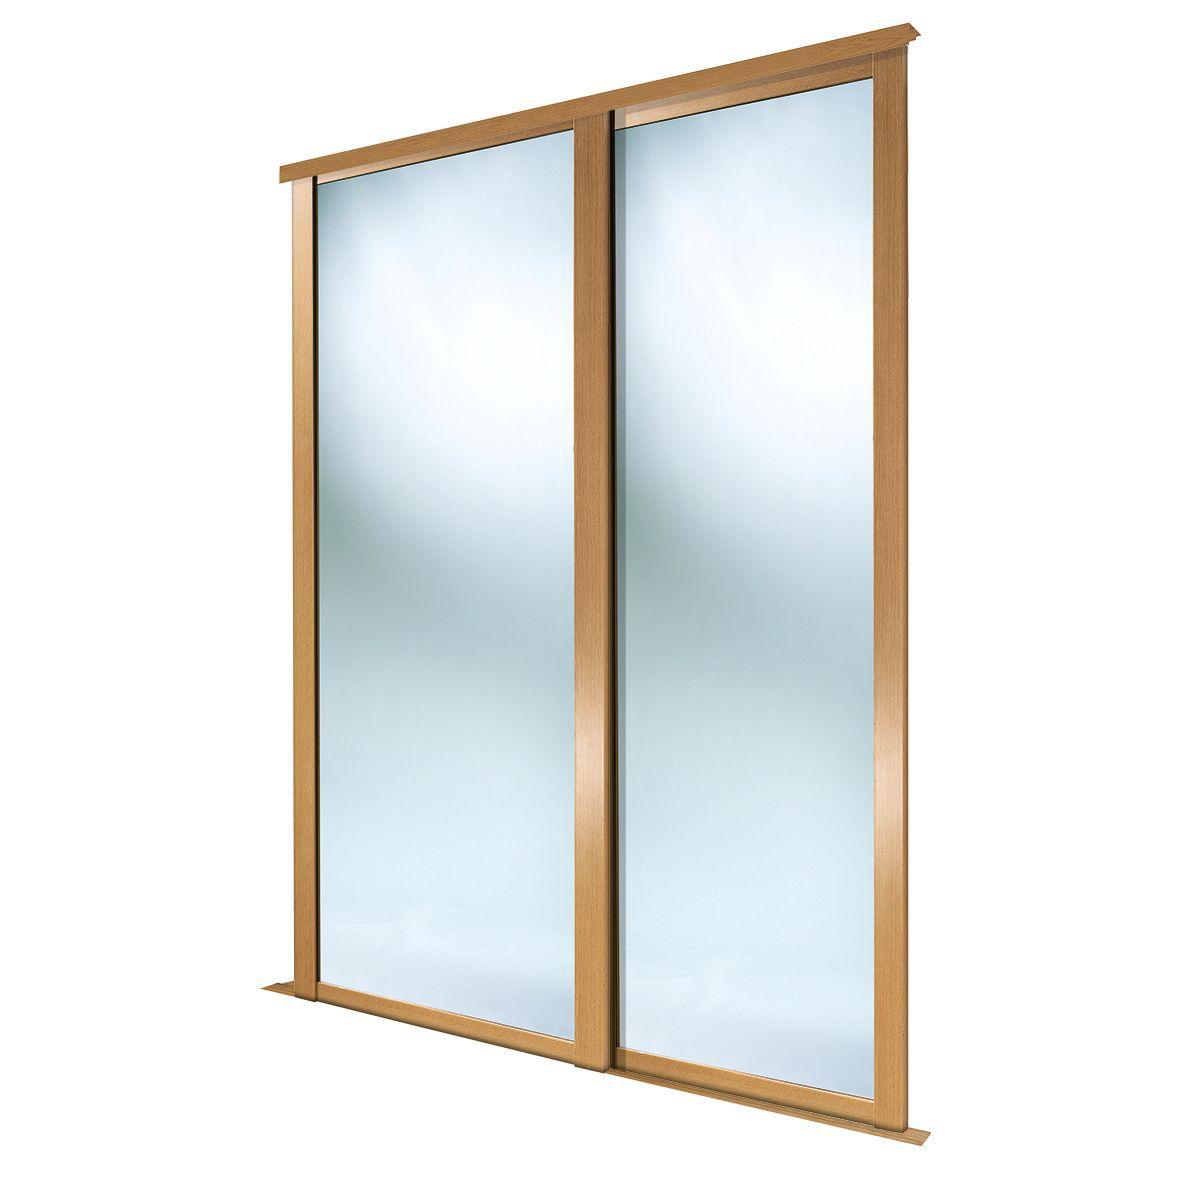 Full Length Mirror Natural Oak Effect Sliding Wardrobe Door (h)2223 Mm (w)762 Mm, Pack Of 2